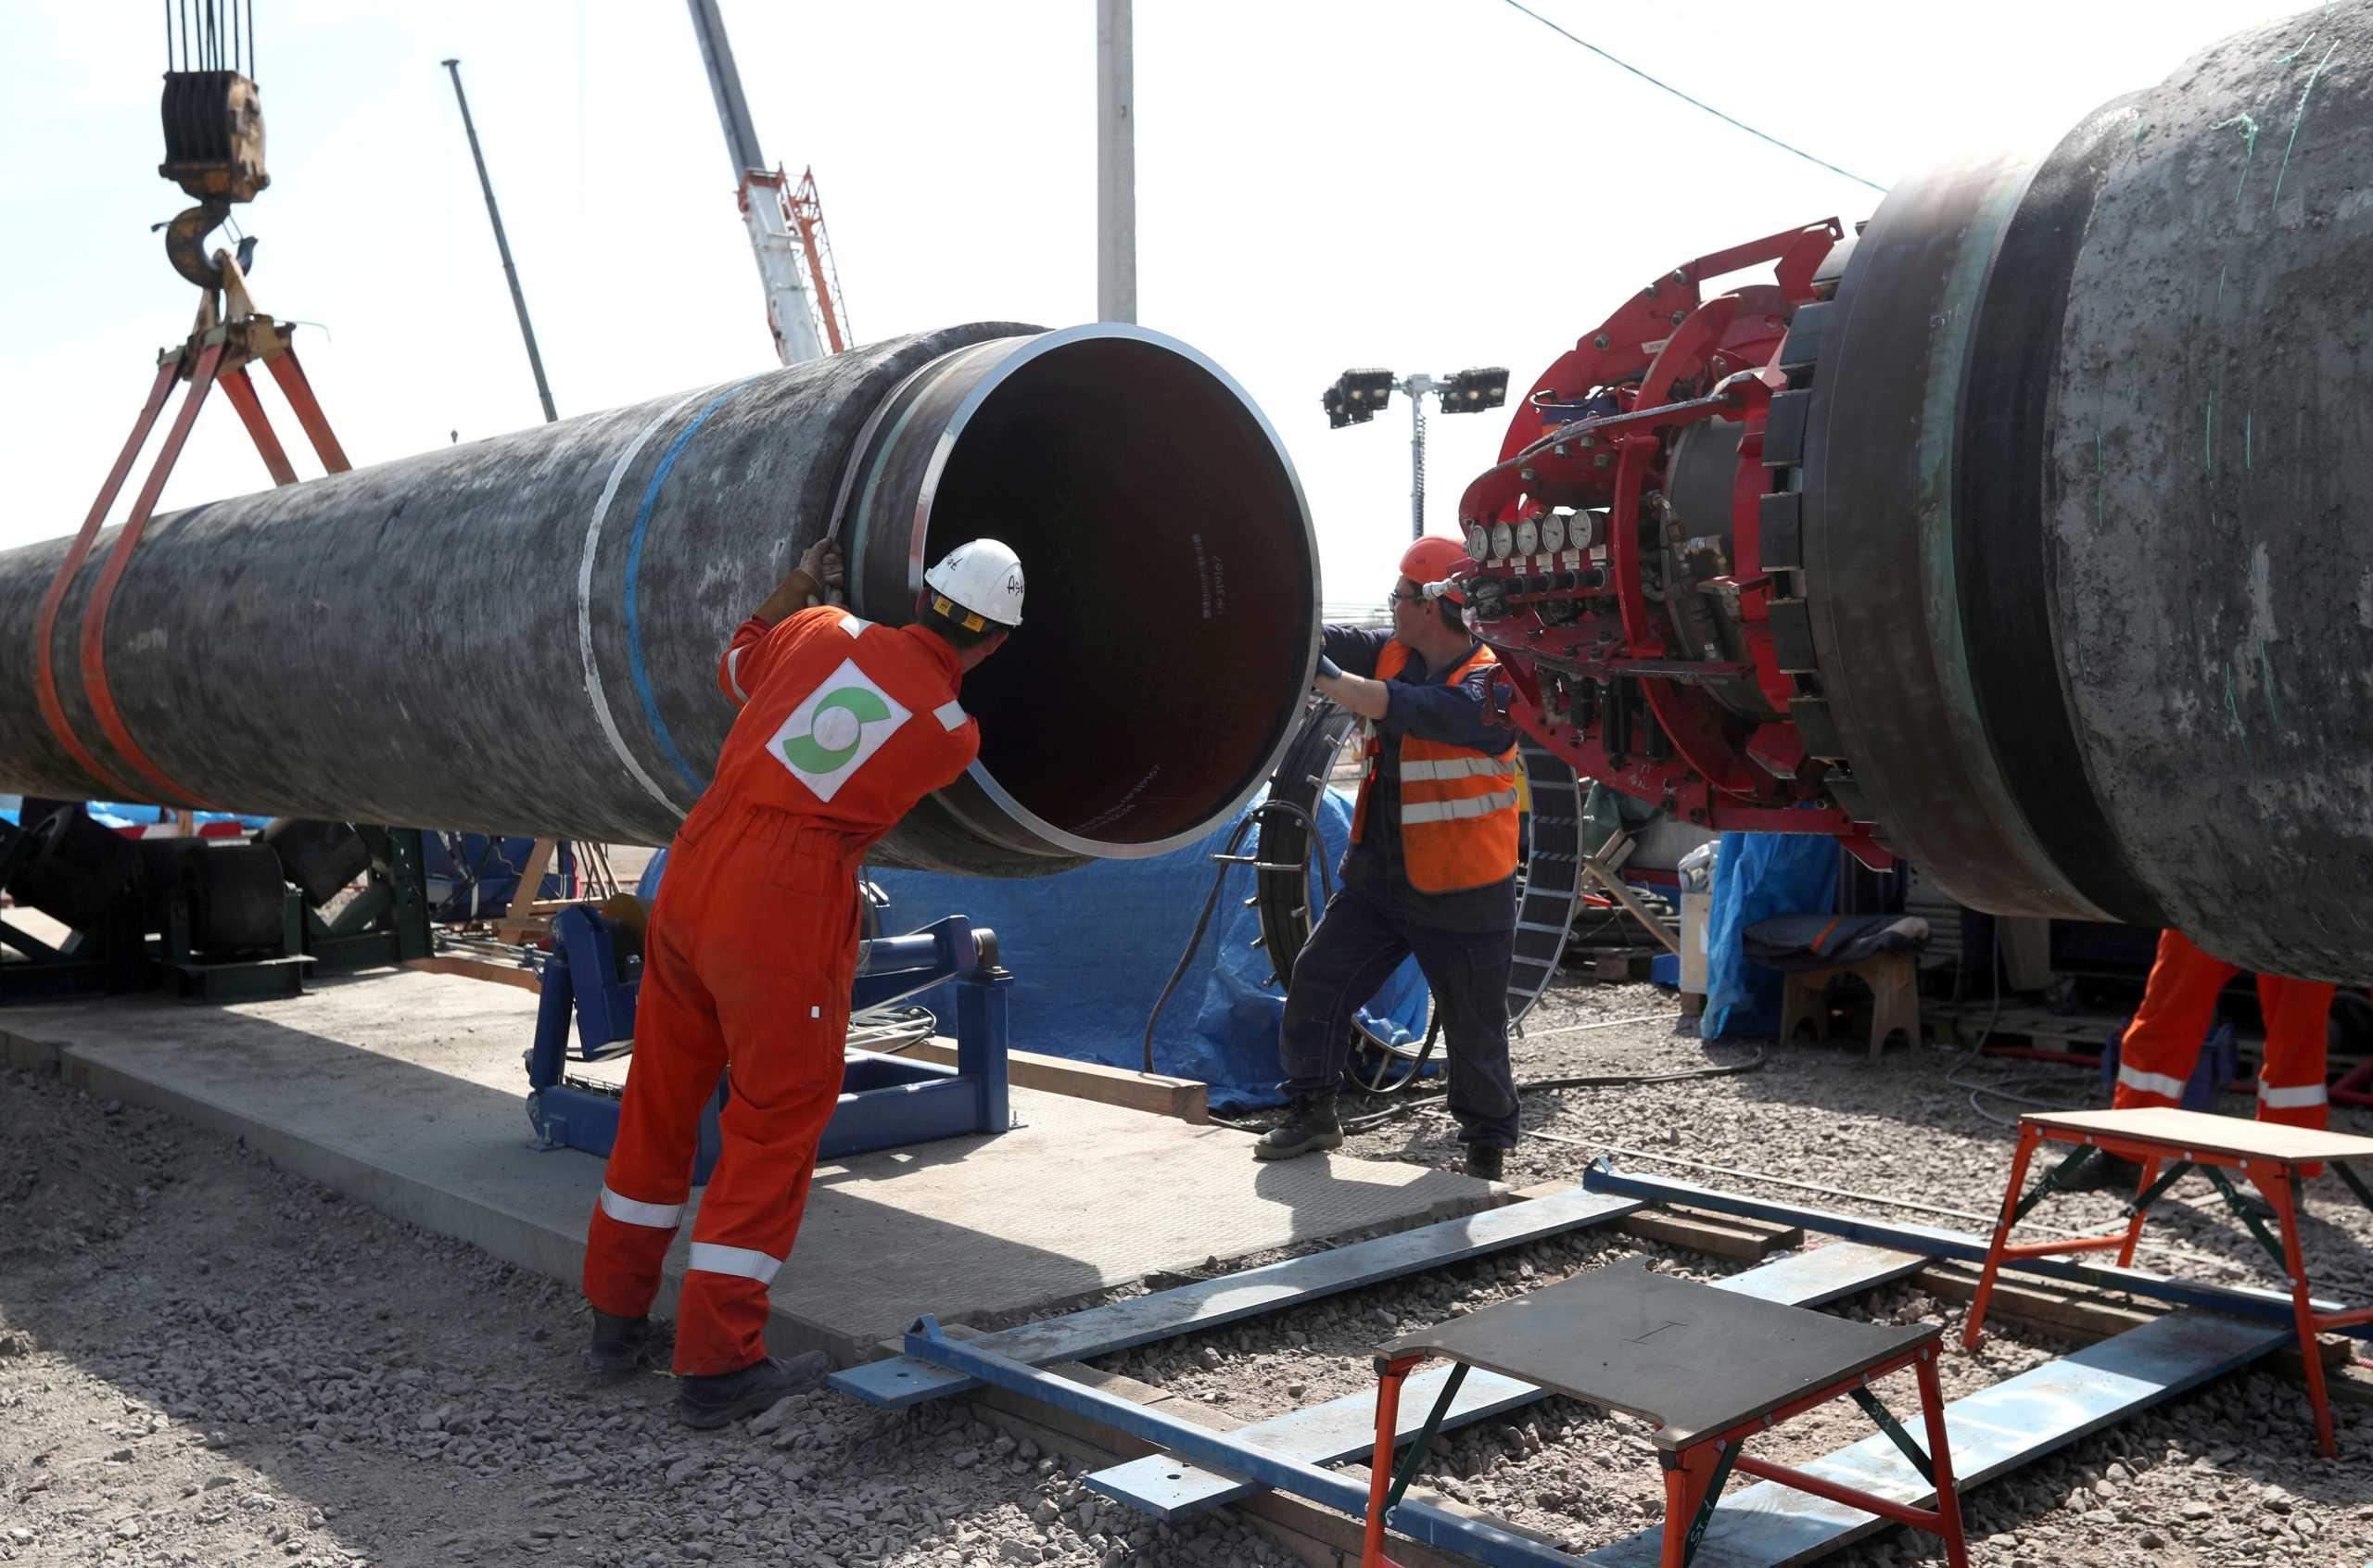 Nord Stream 2: Η Μόσχα χαιρετίζει αλλά και διαφωνεί με ορισμένες θέσεις της συμφωνίας ΗΠΑ-Γερμανίας